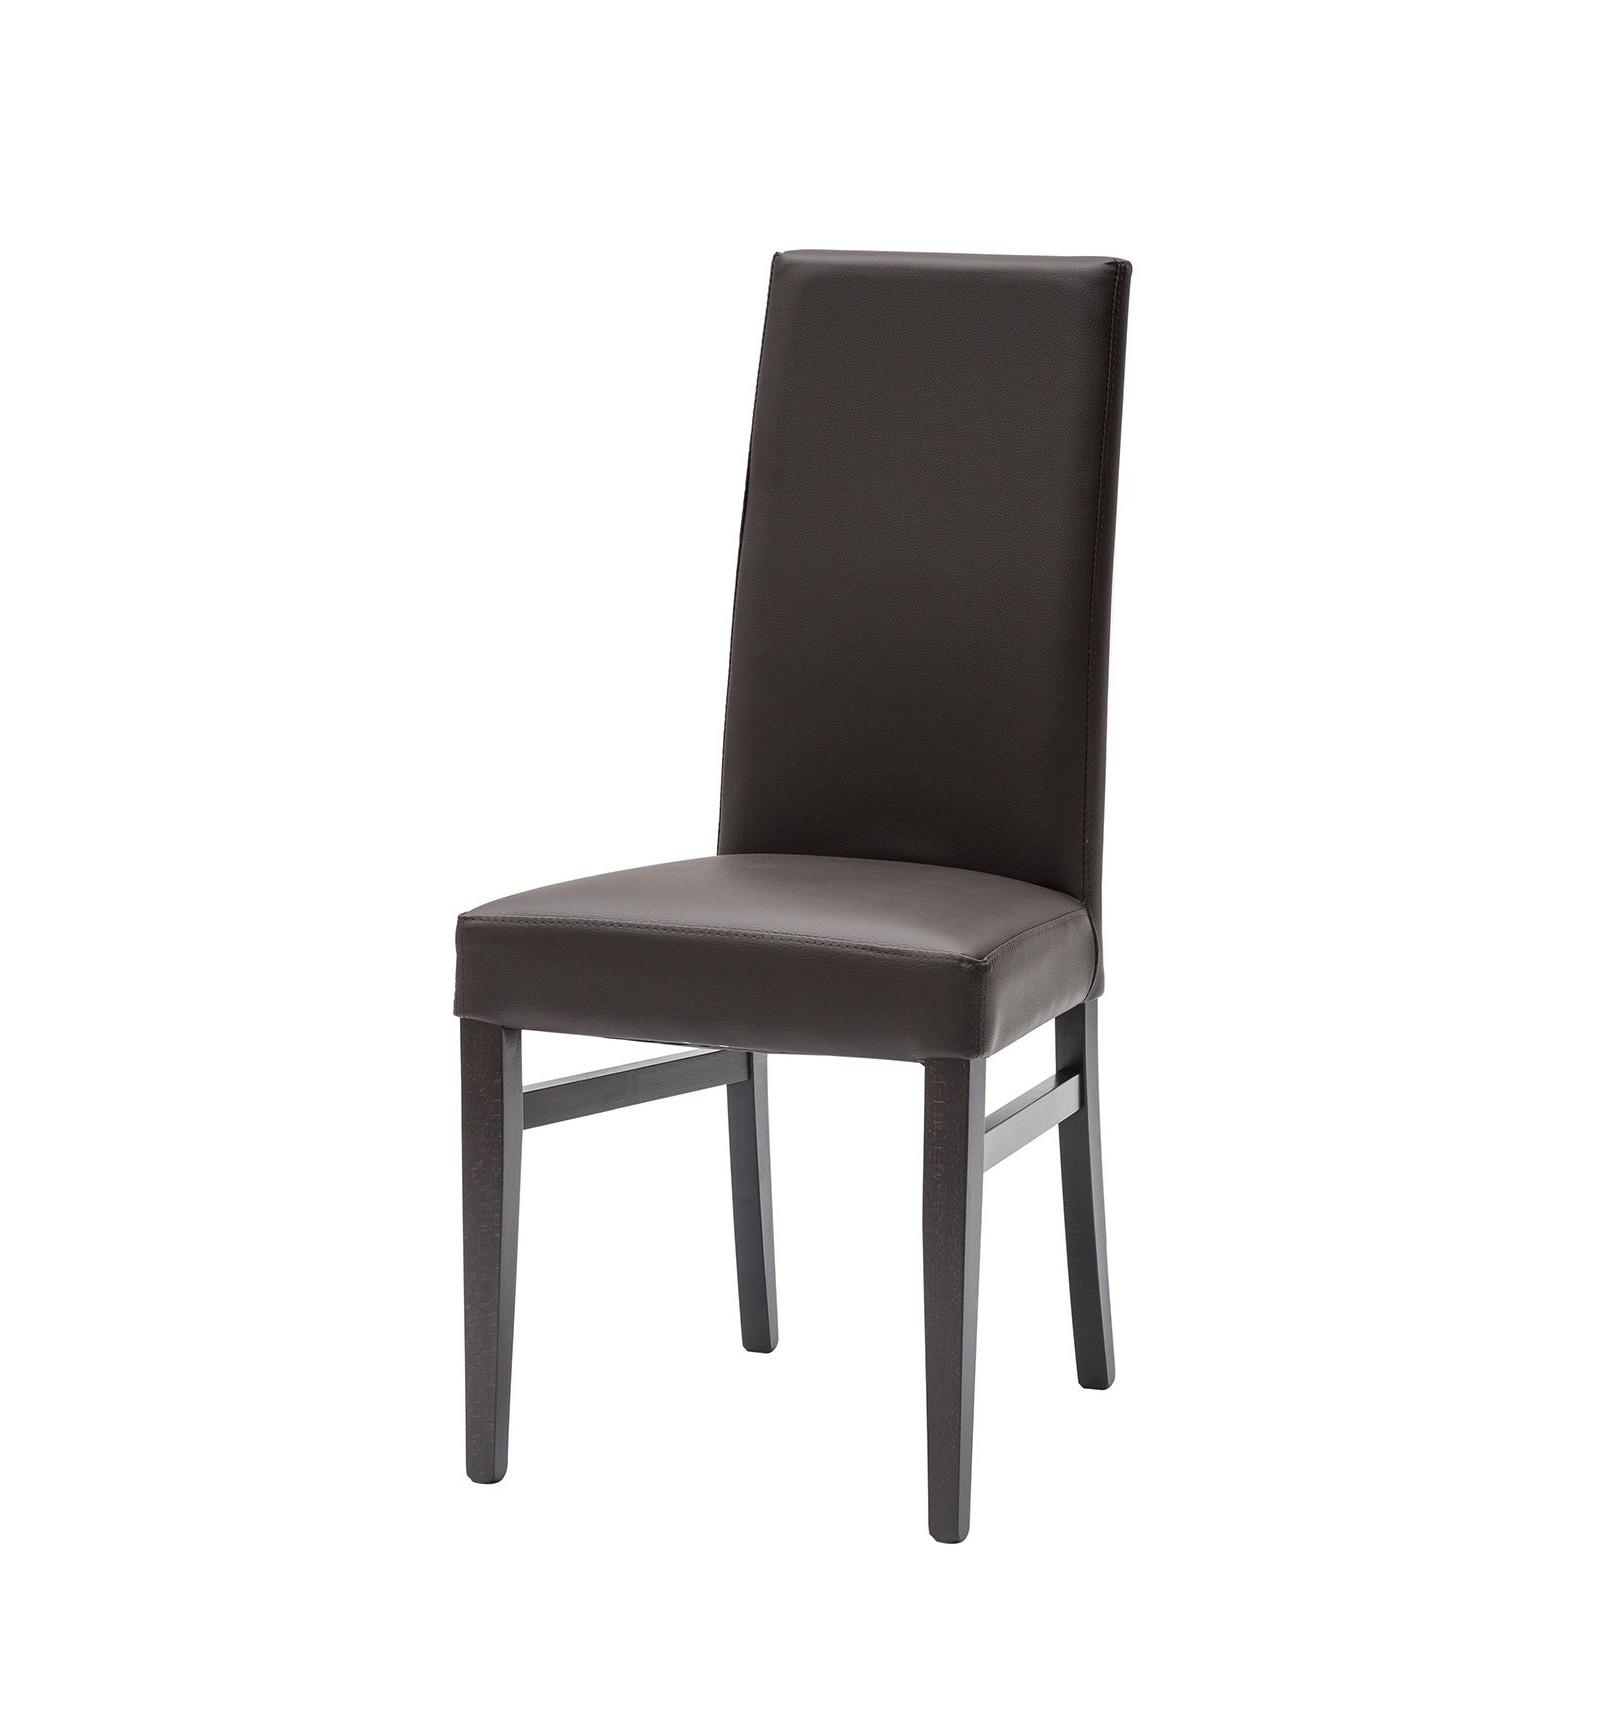 set 2 sedie moderne ecopelle testa di moro con fusto wenge